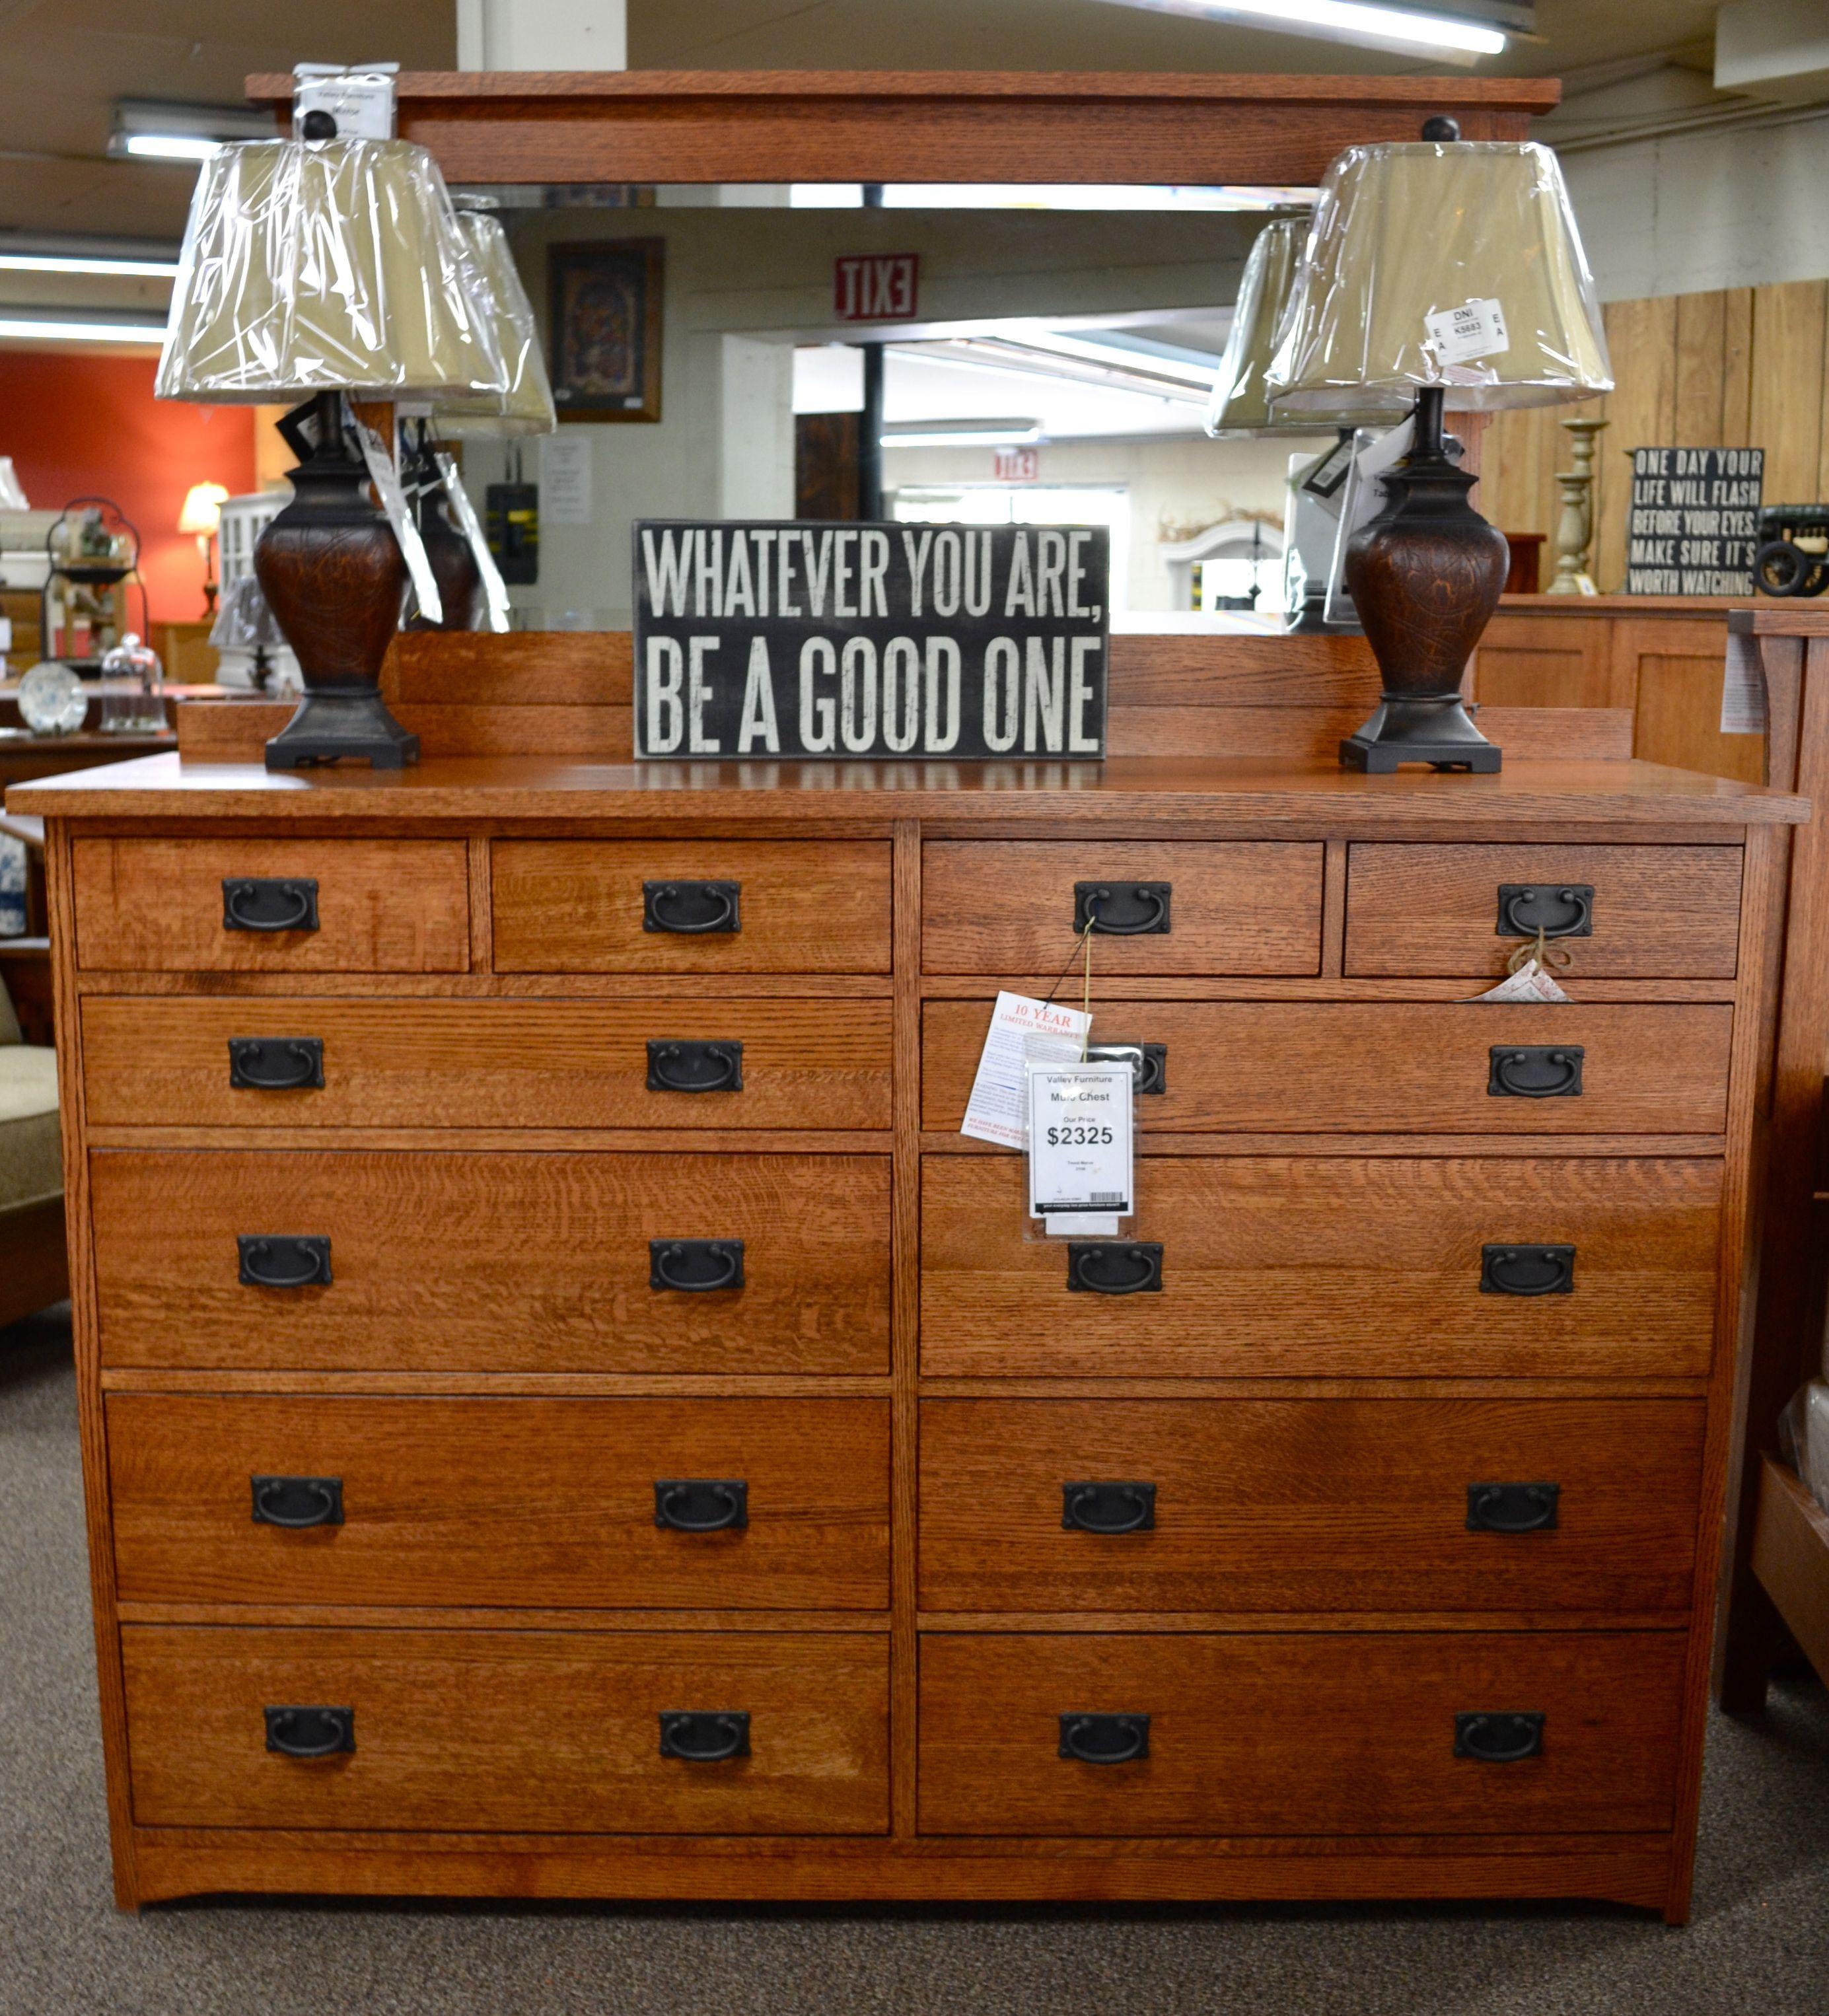 Mission or craftsman style woodwork dresser at Tucker's